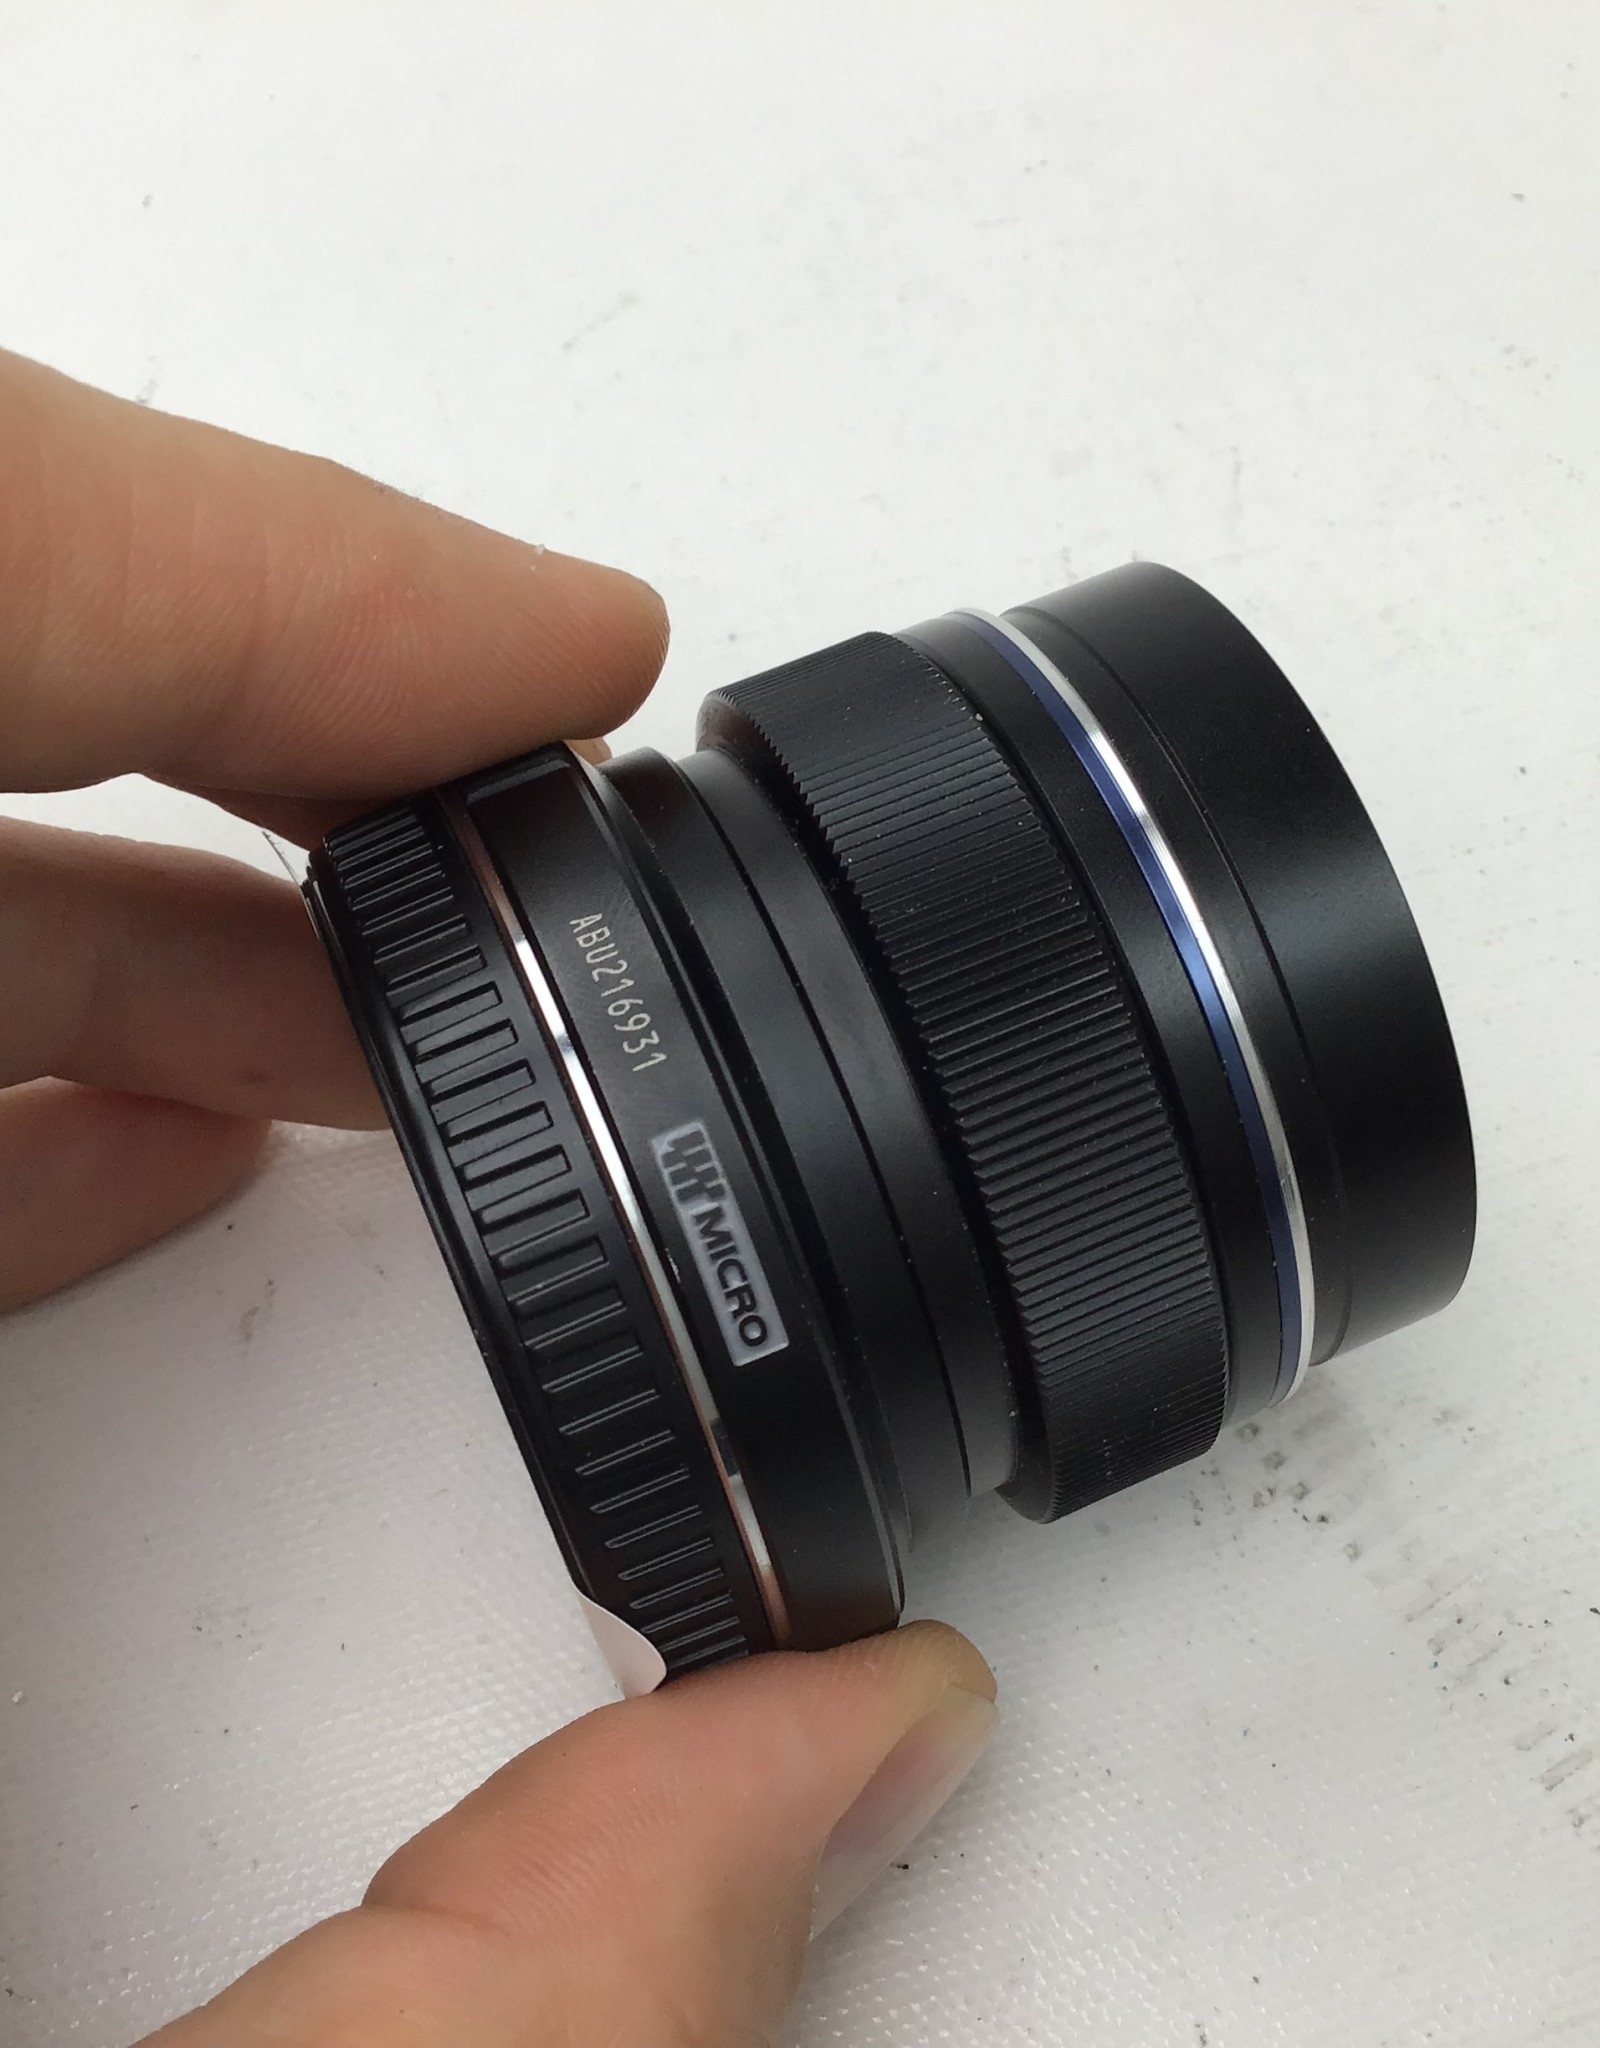 OLYMPUS Olympus 12mm f2.0 Lens with Hood Used Good